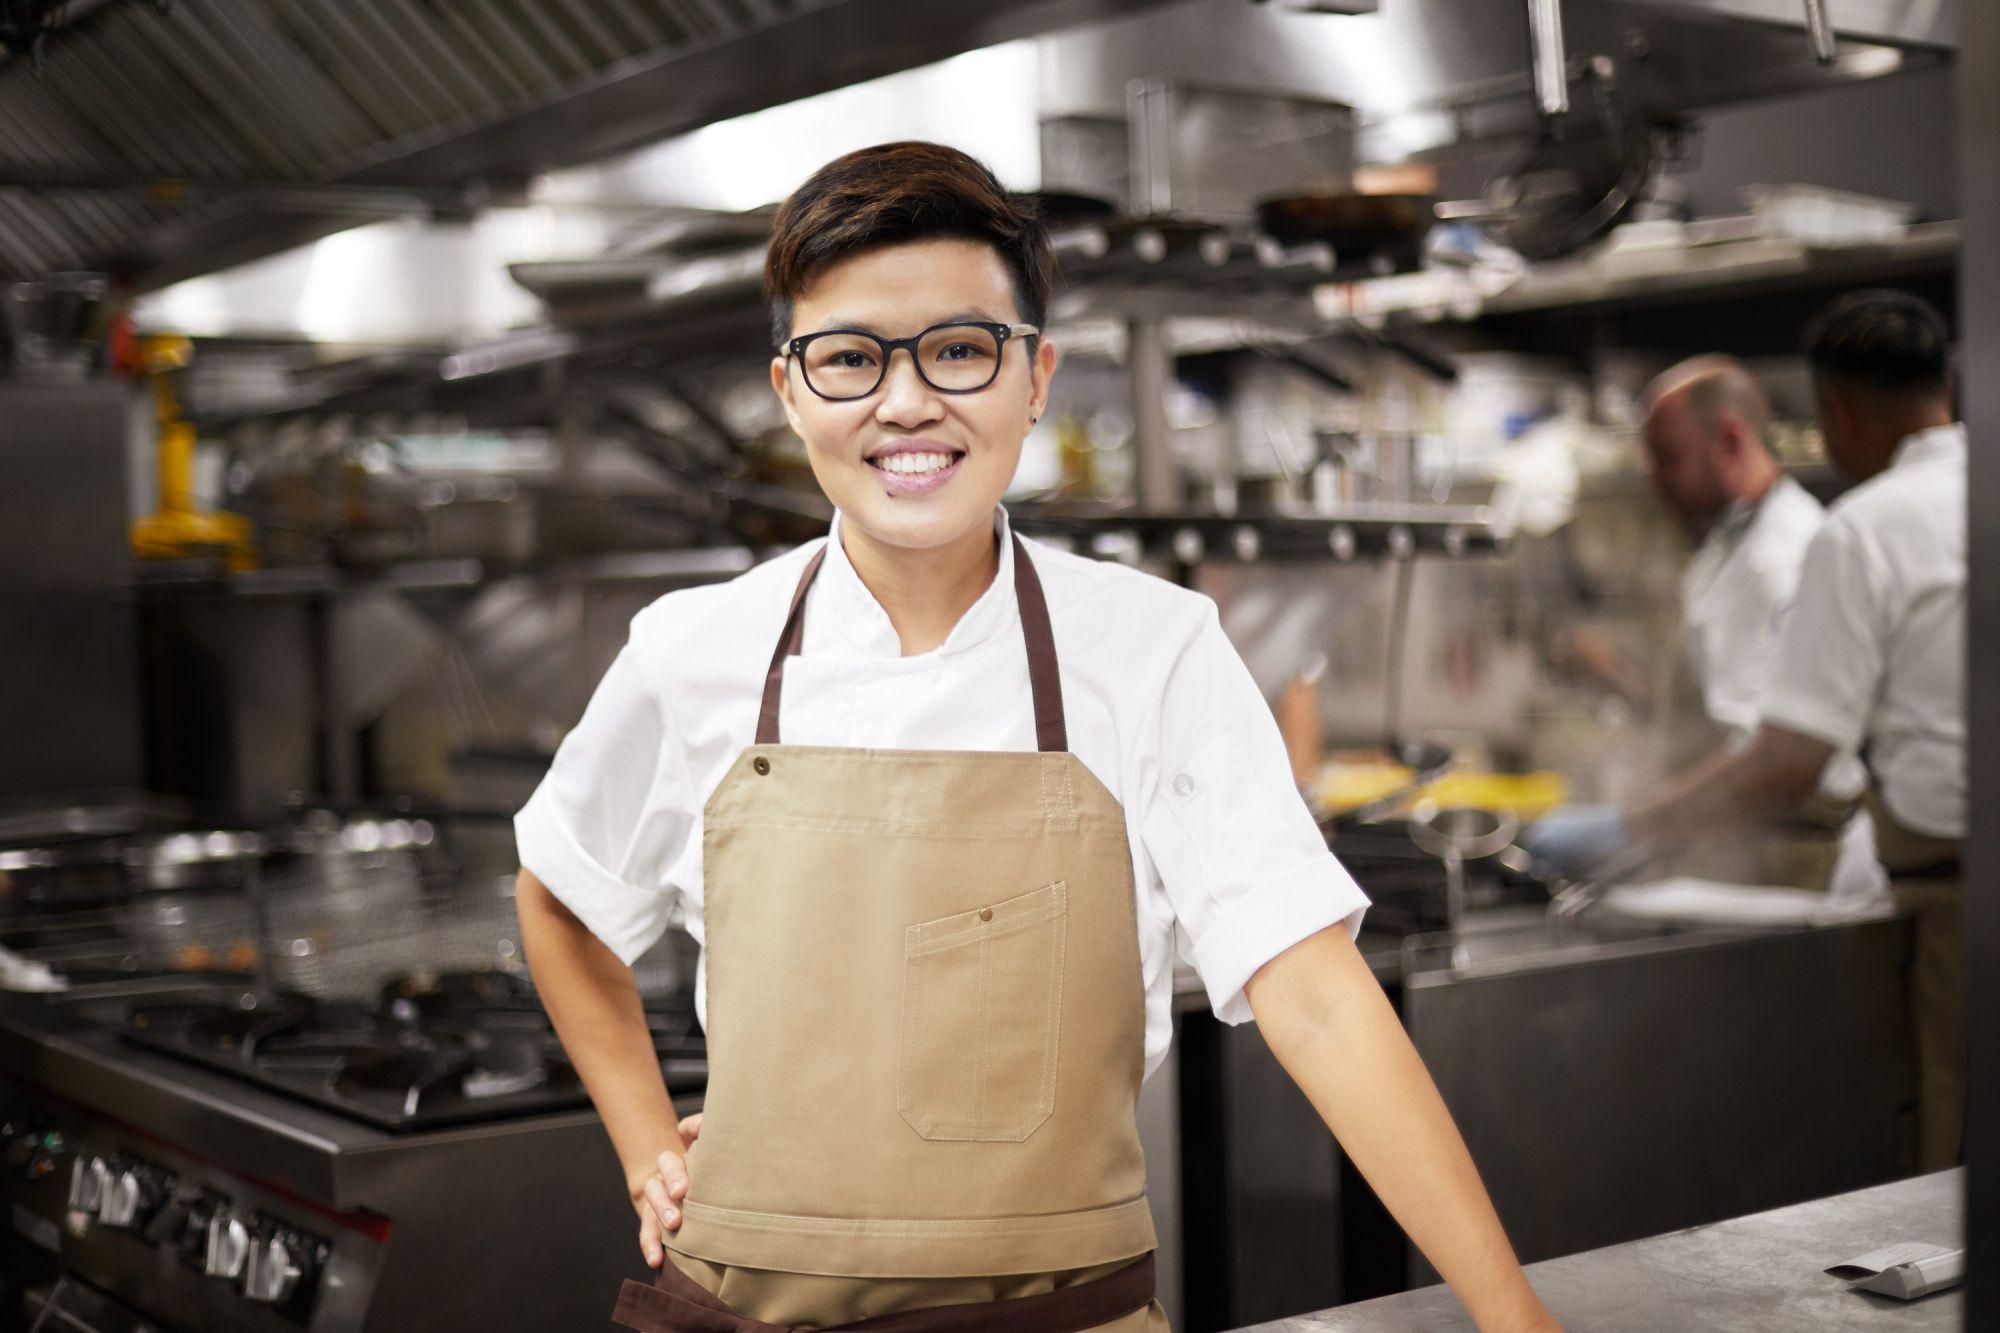 Chef ArChan Chan